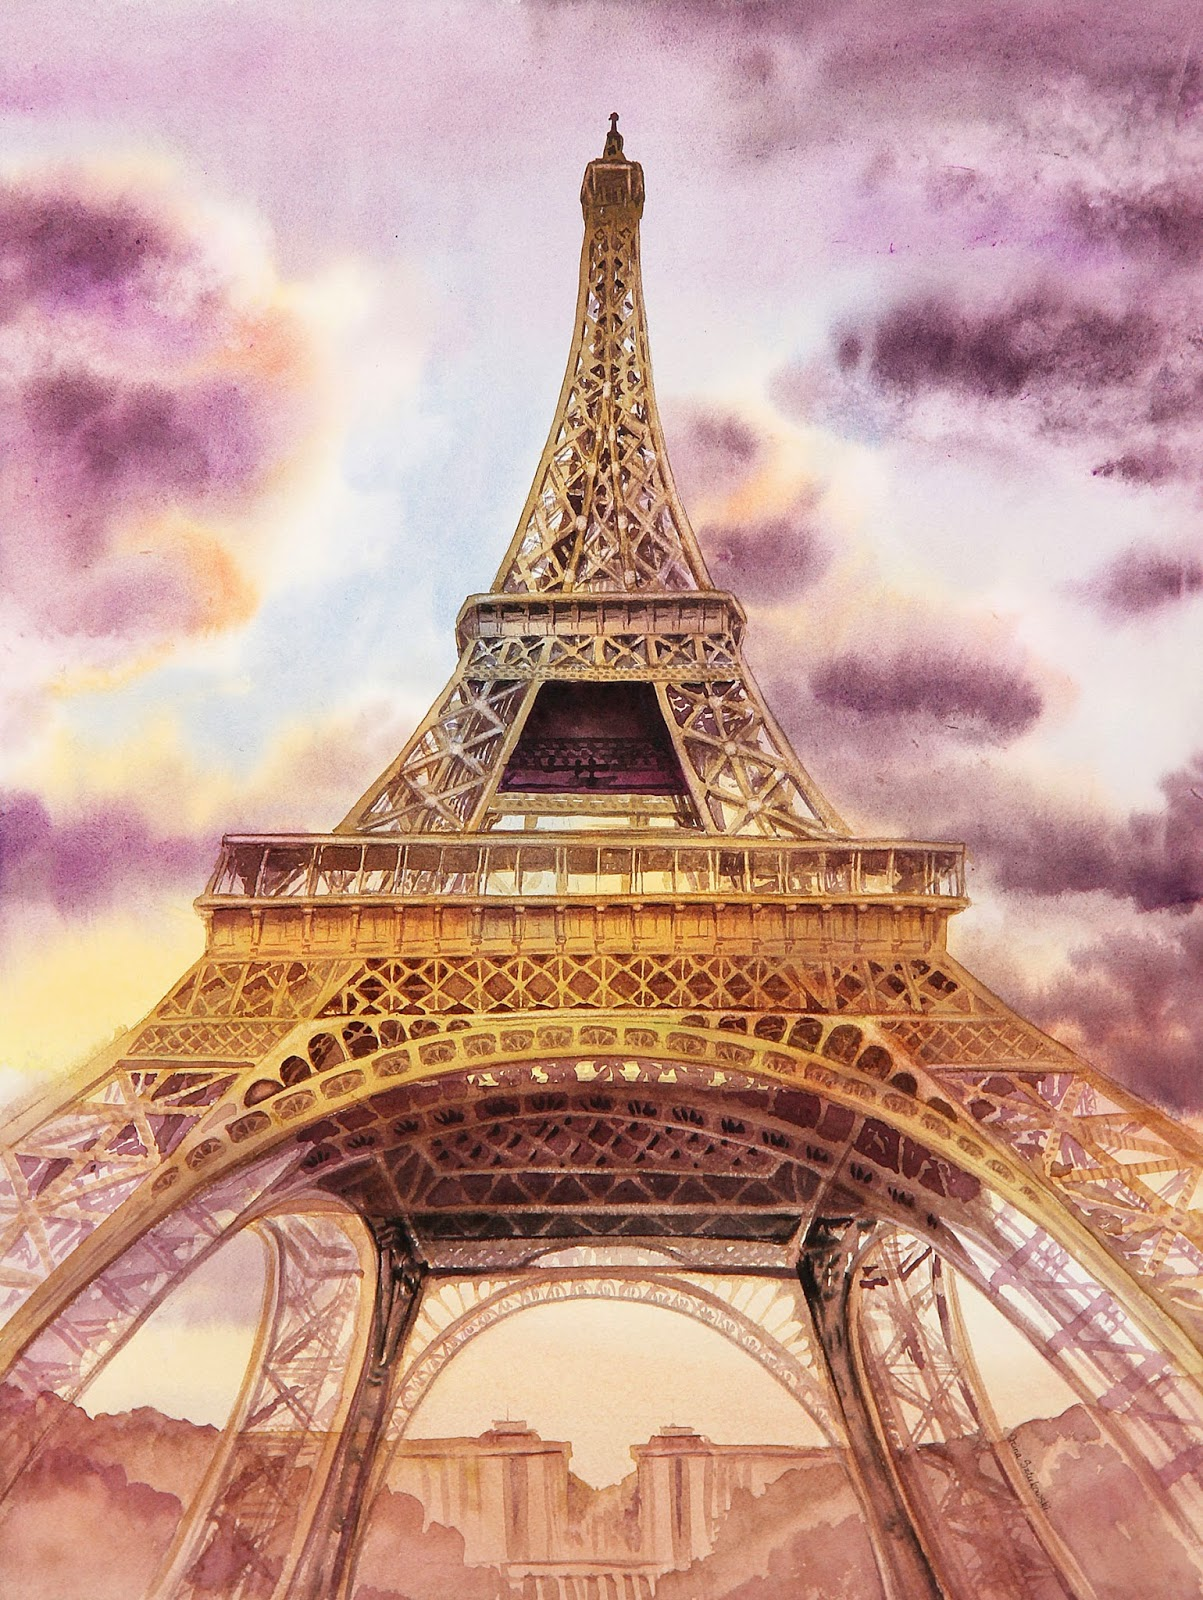 realism in watercolor evening Paris